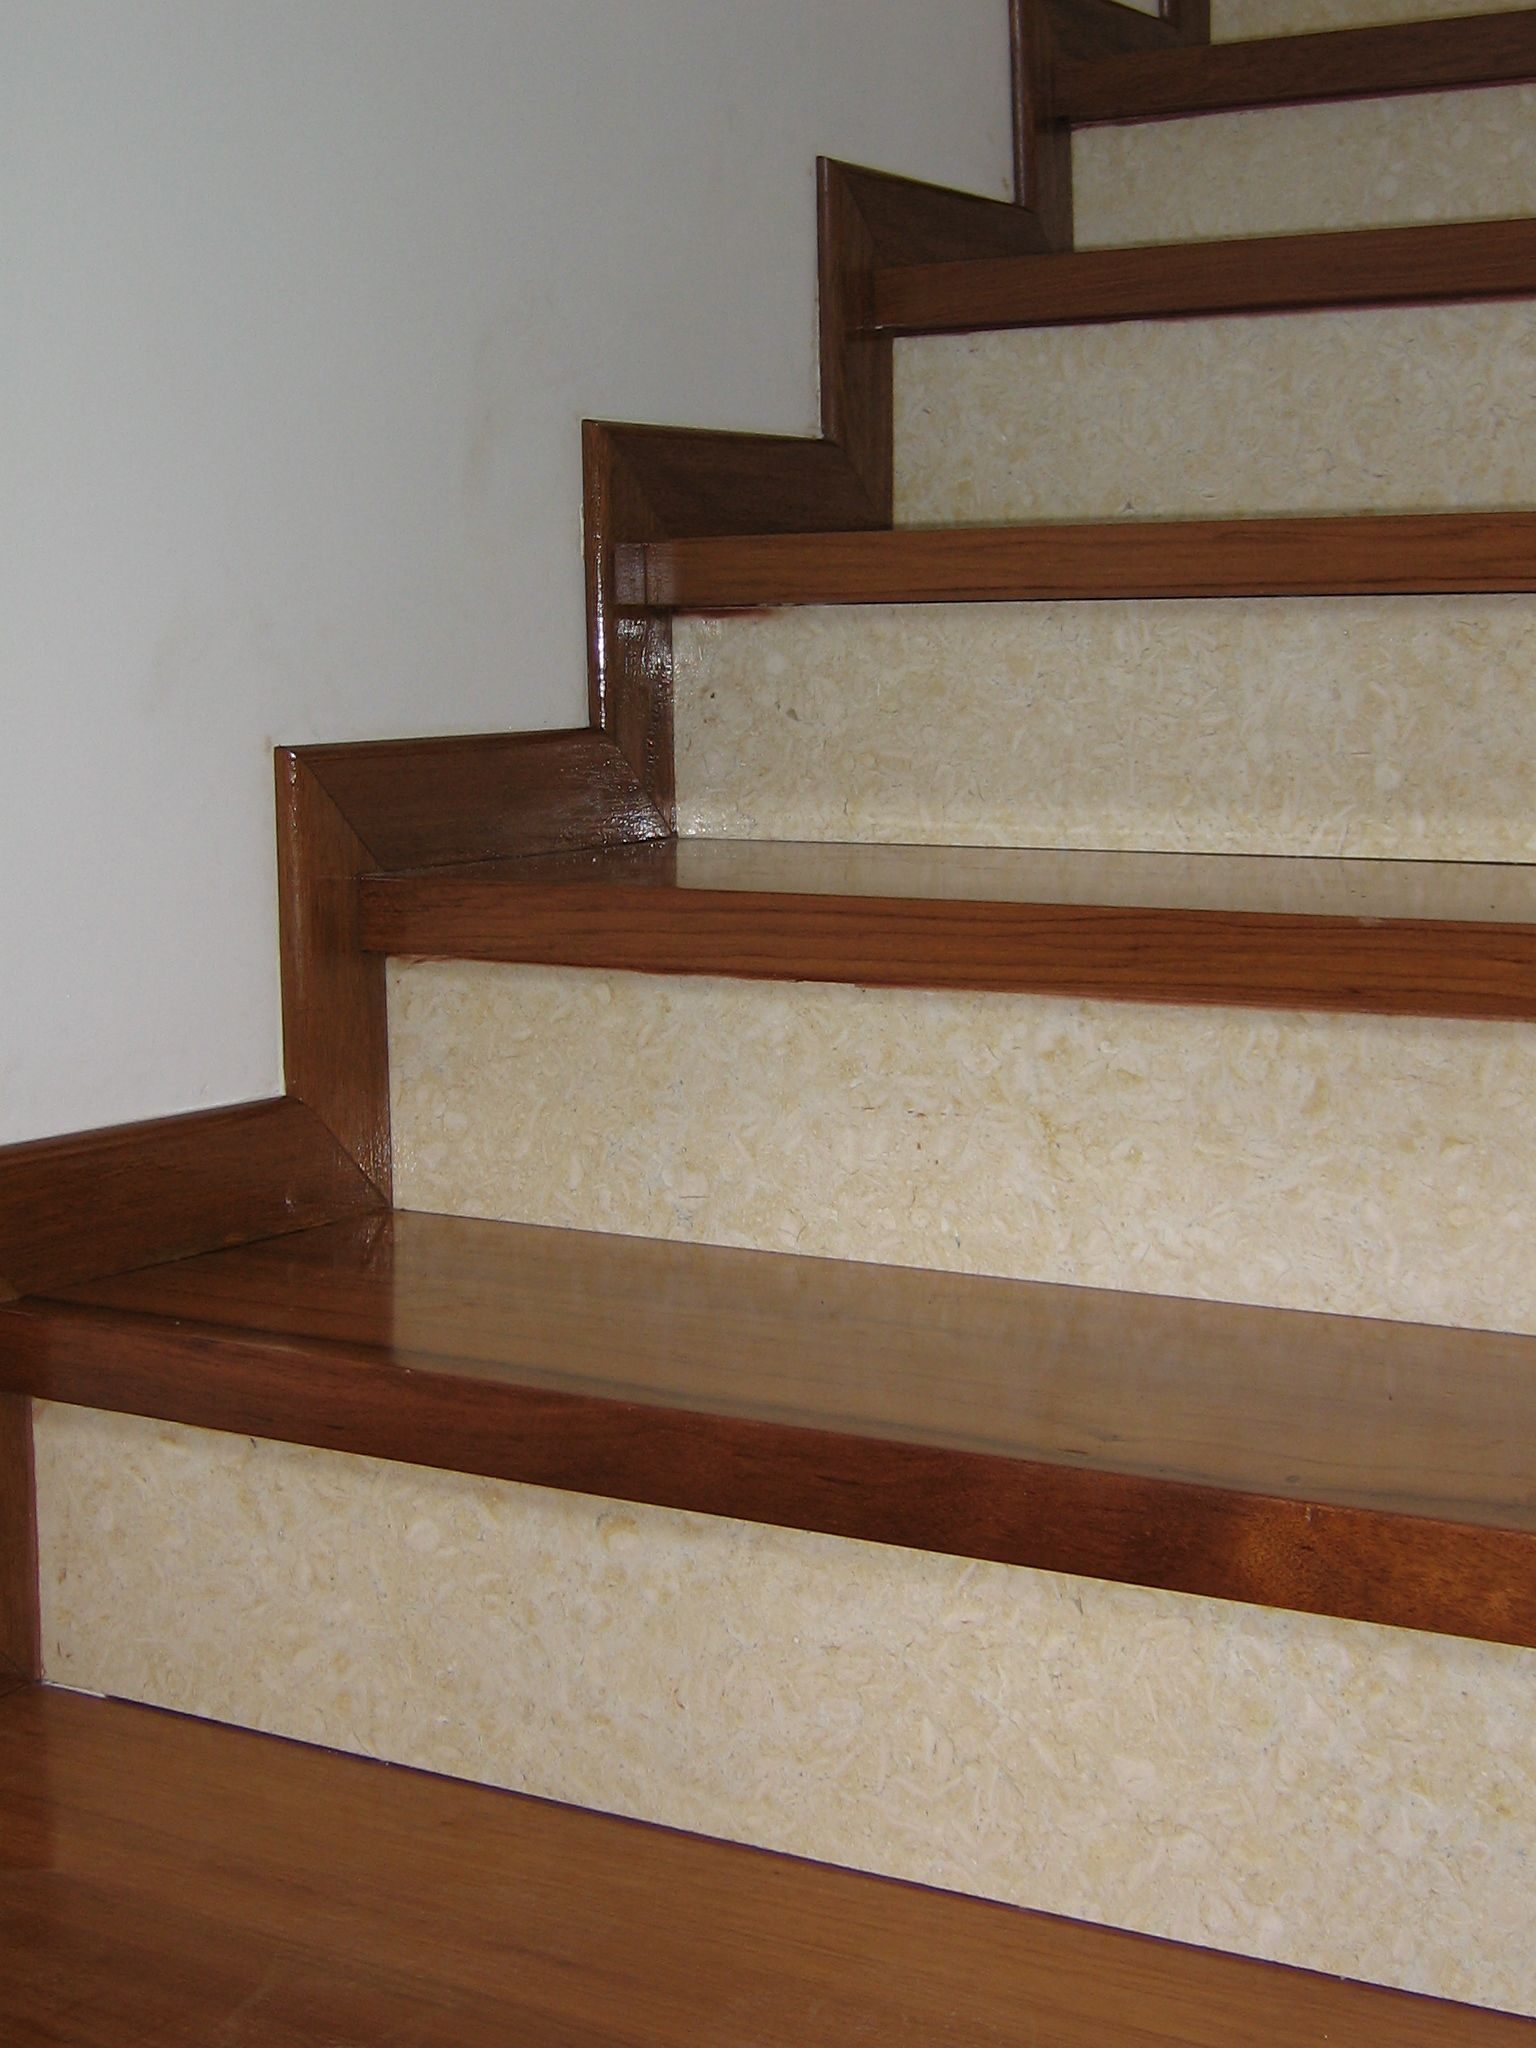 Huellas de escalera de madera buscar con google planos for Escalera 5 pasos afuera